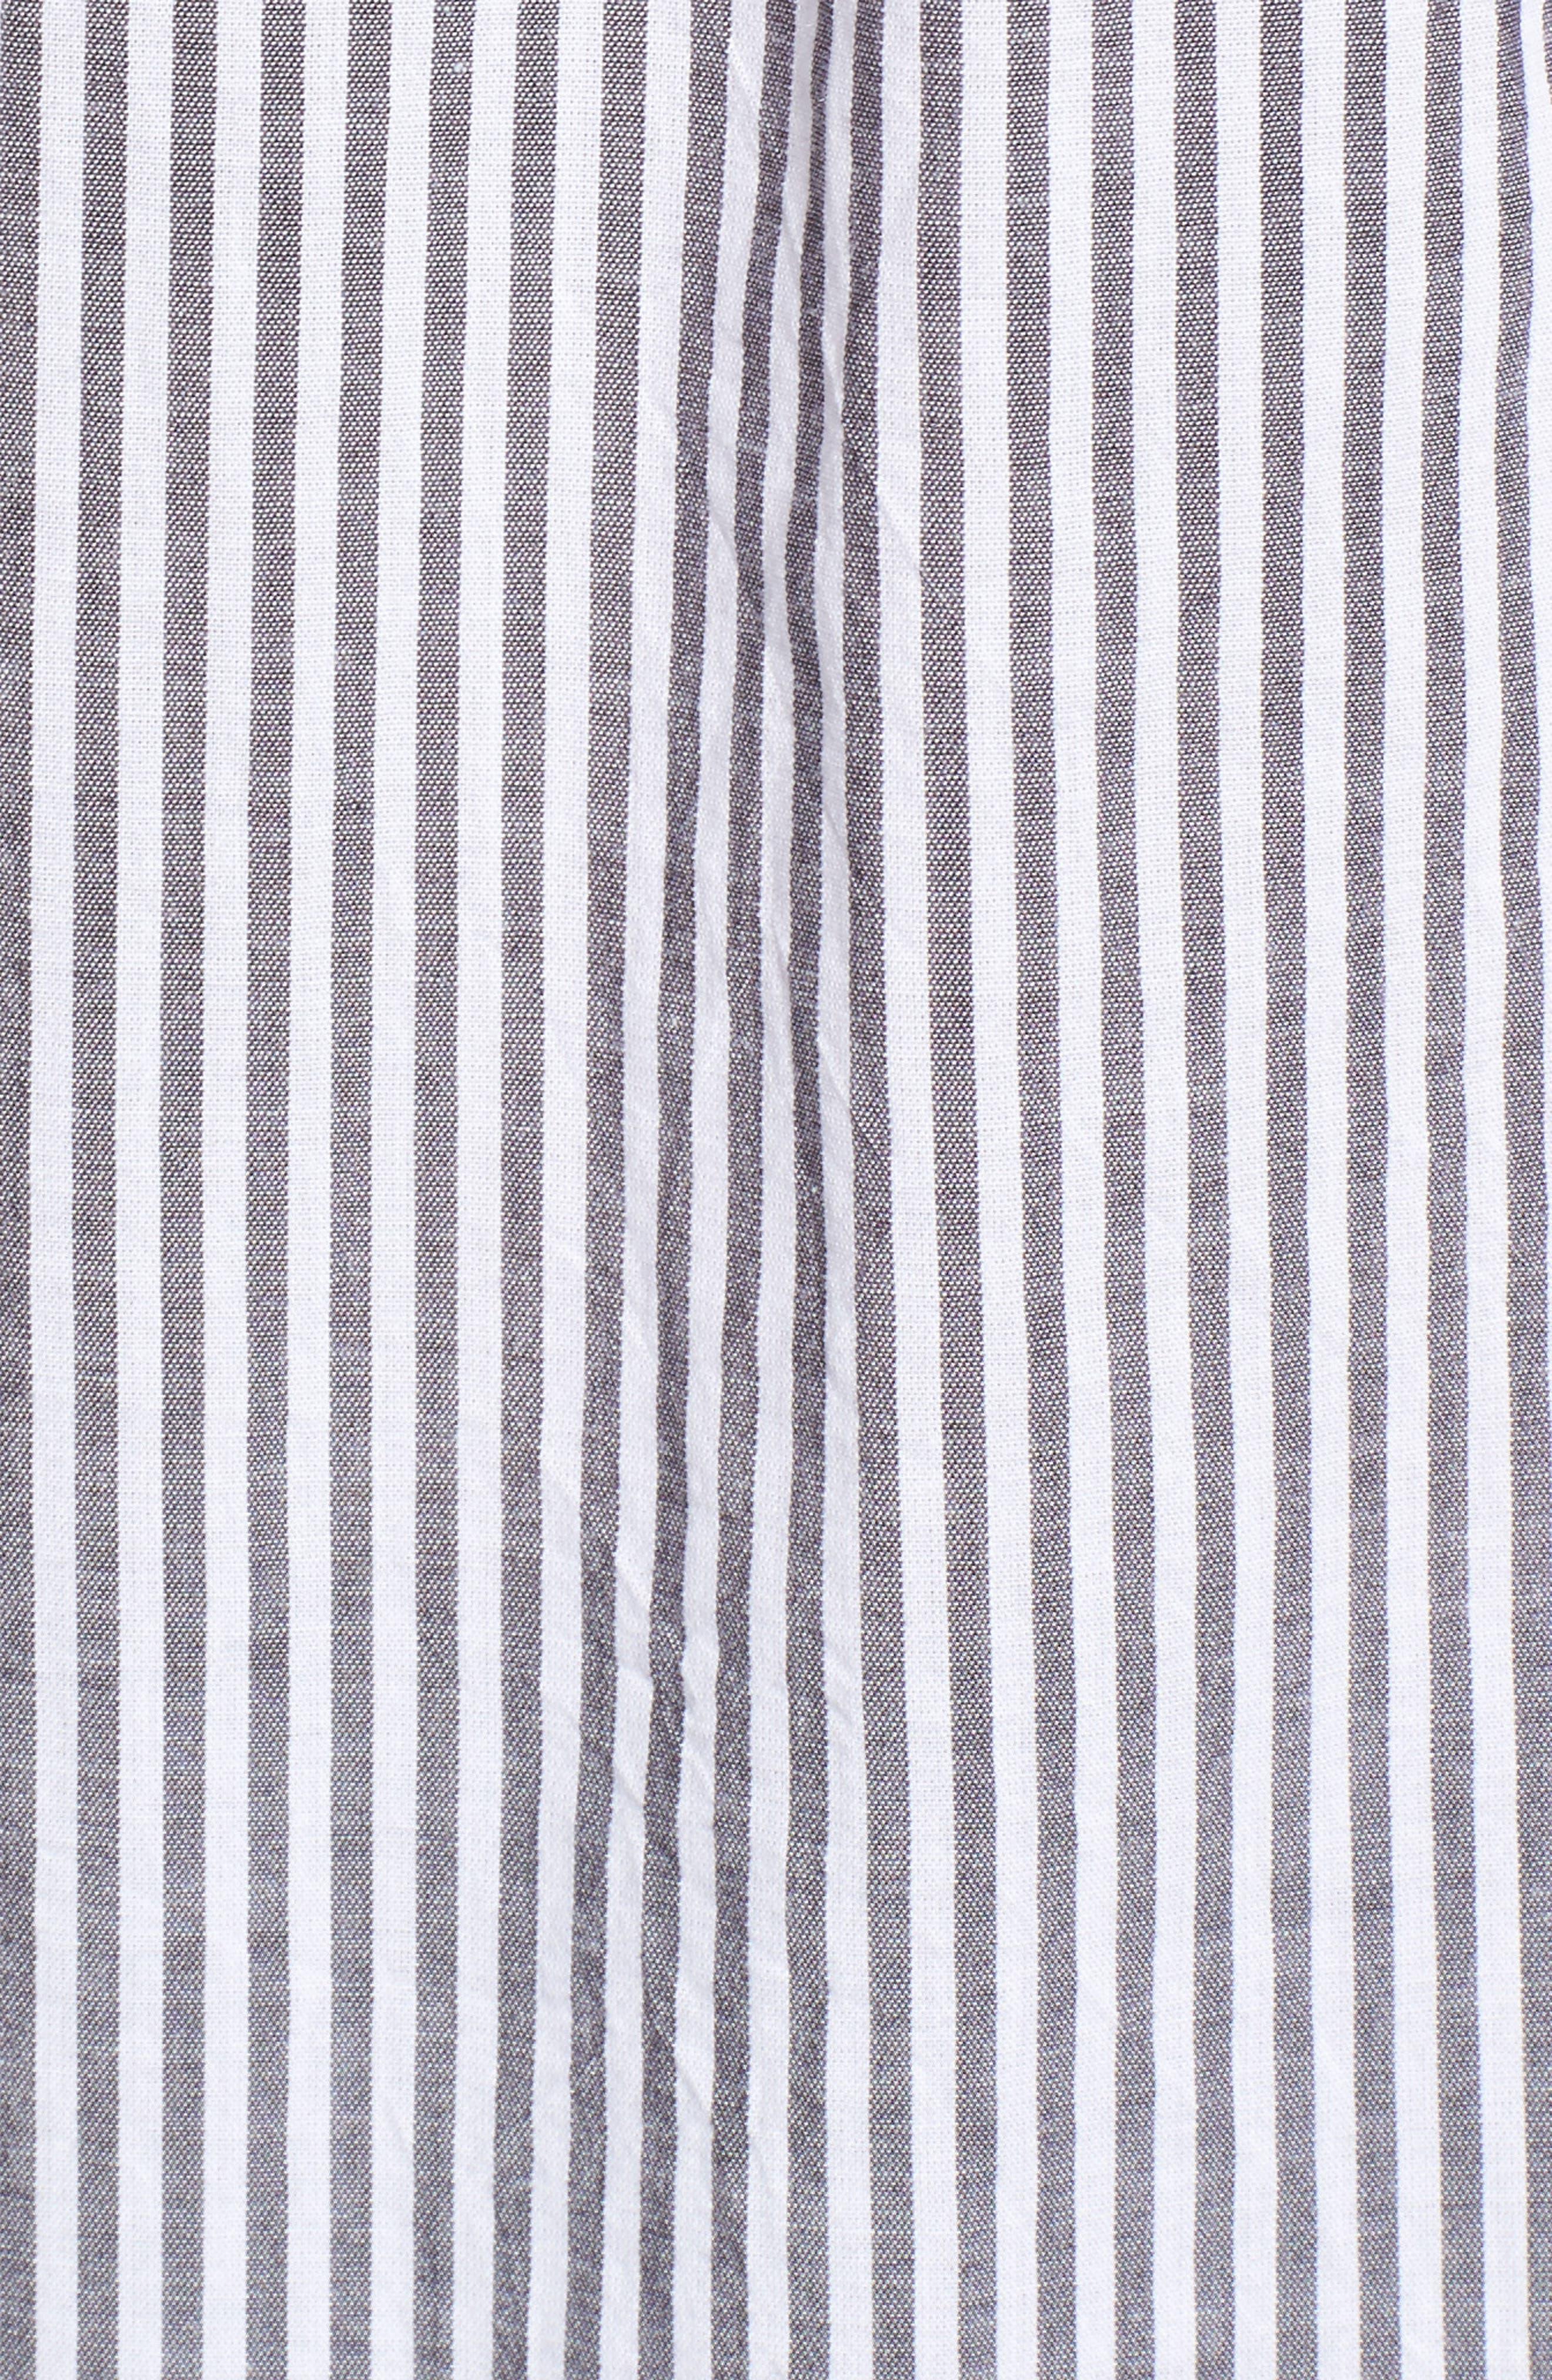 Taylor Embellished Shirt,                             Alternate thumbnail 5, color,                             Florence Stripe Studded Pearls